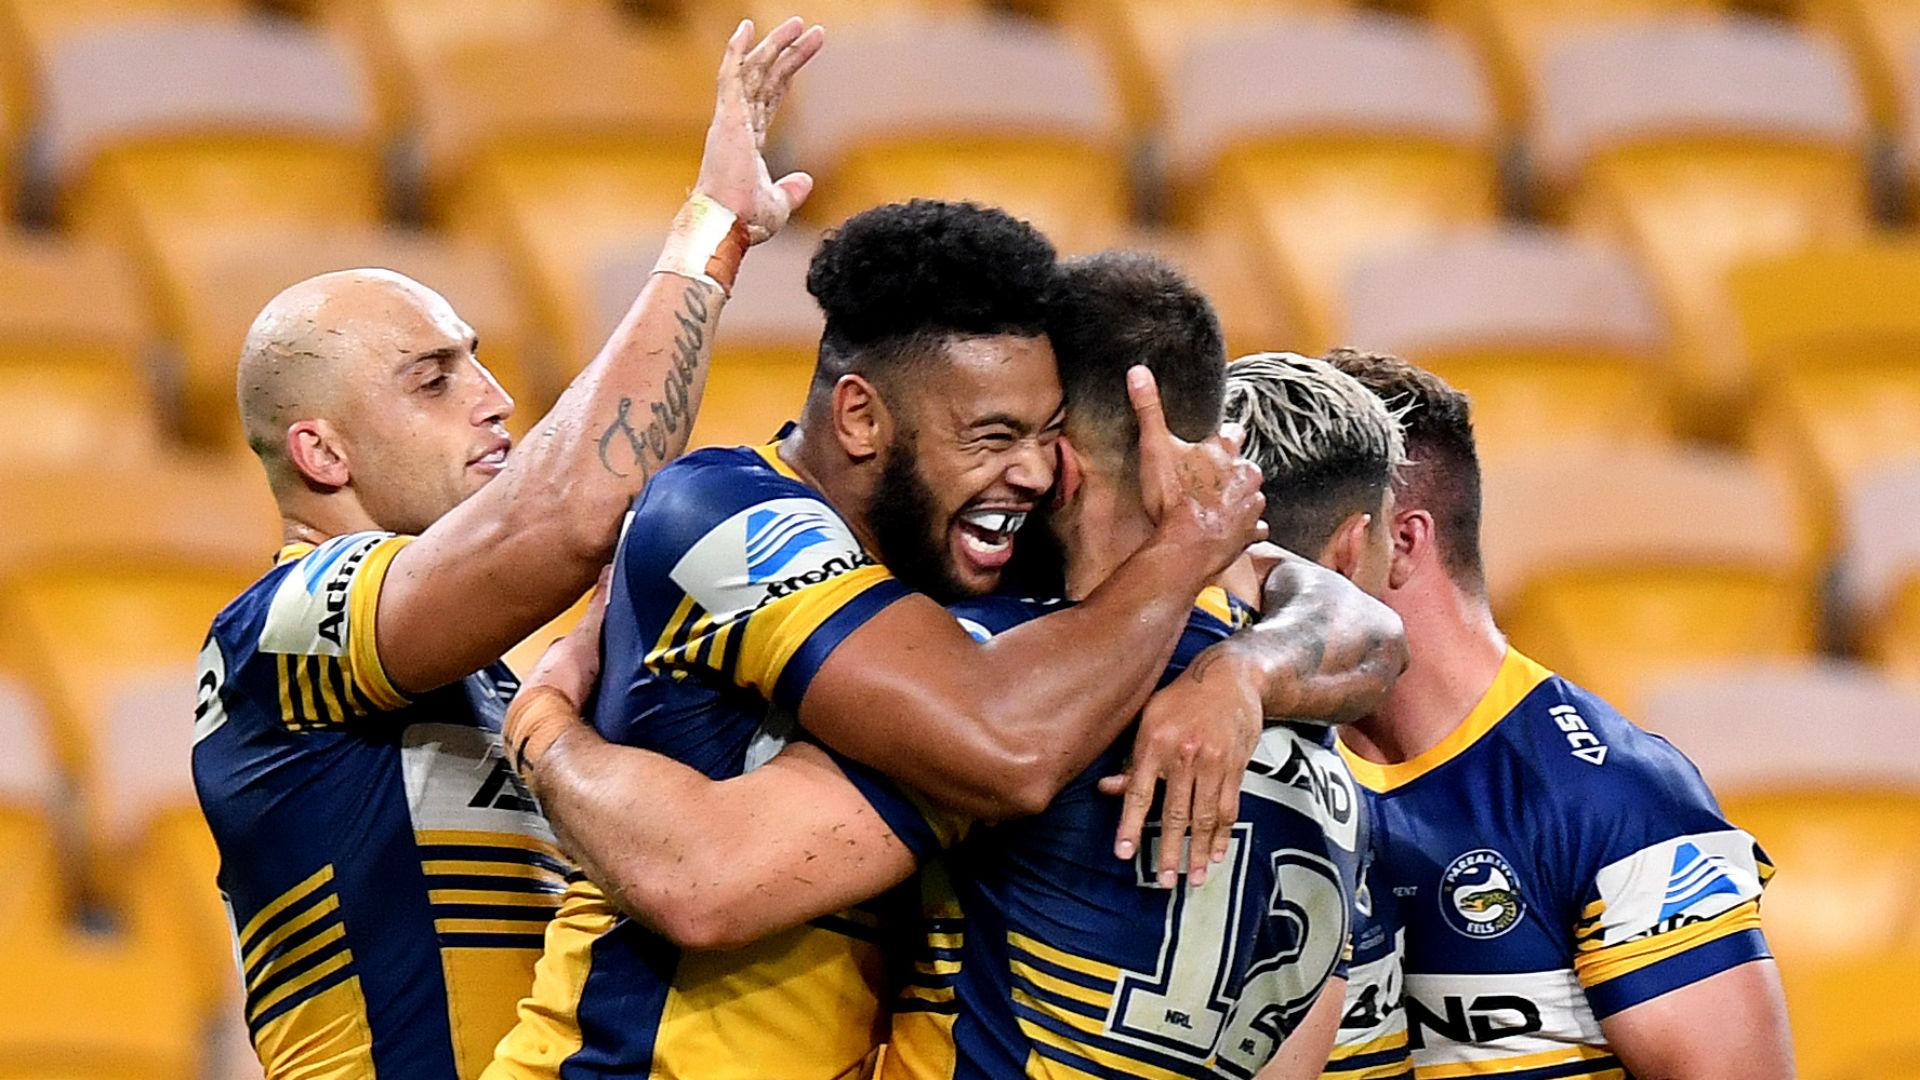 Brisbane Broncos 6-34 Parramatta Eeels: Visitors maintain unbeaten start as NRL season resumes